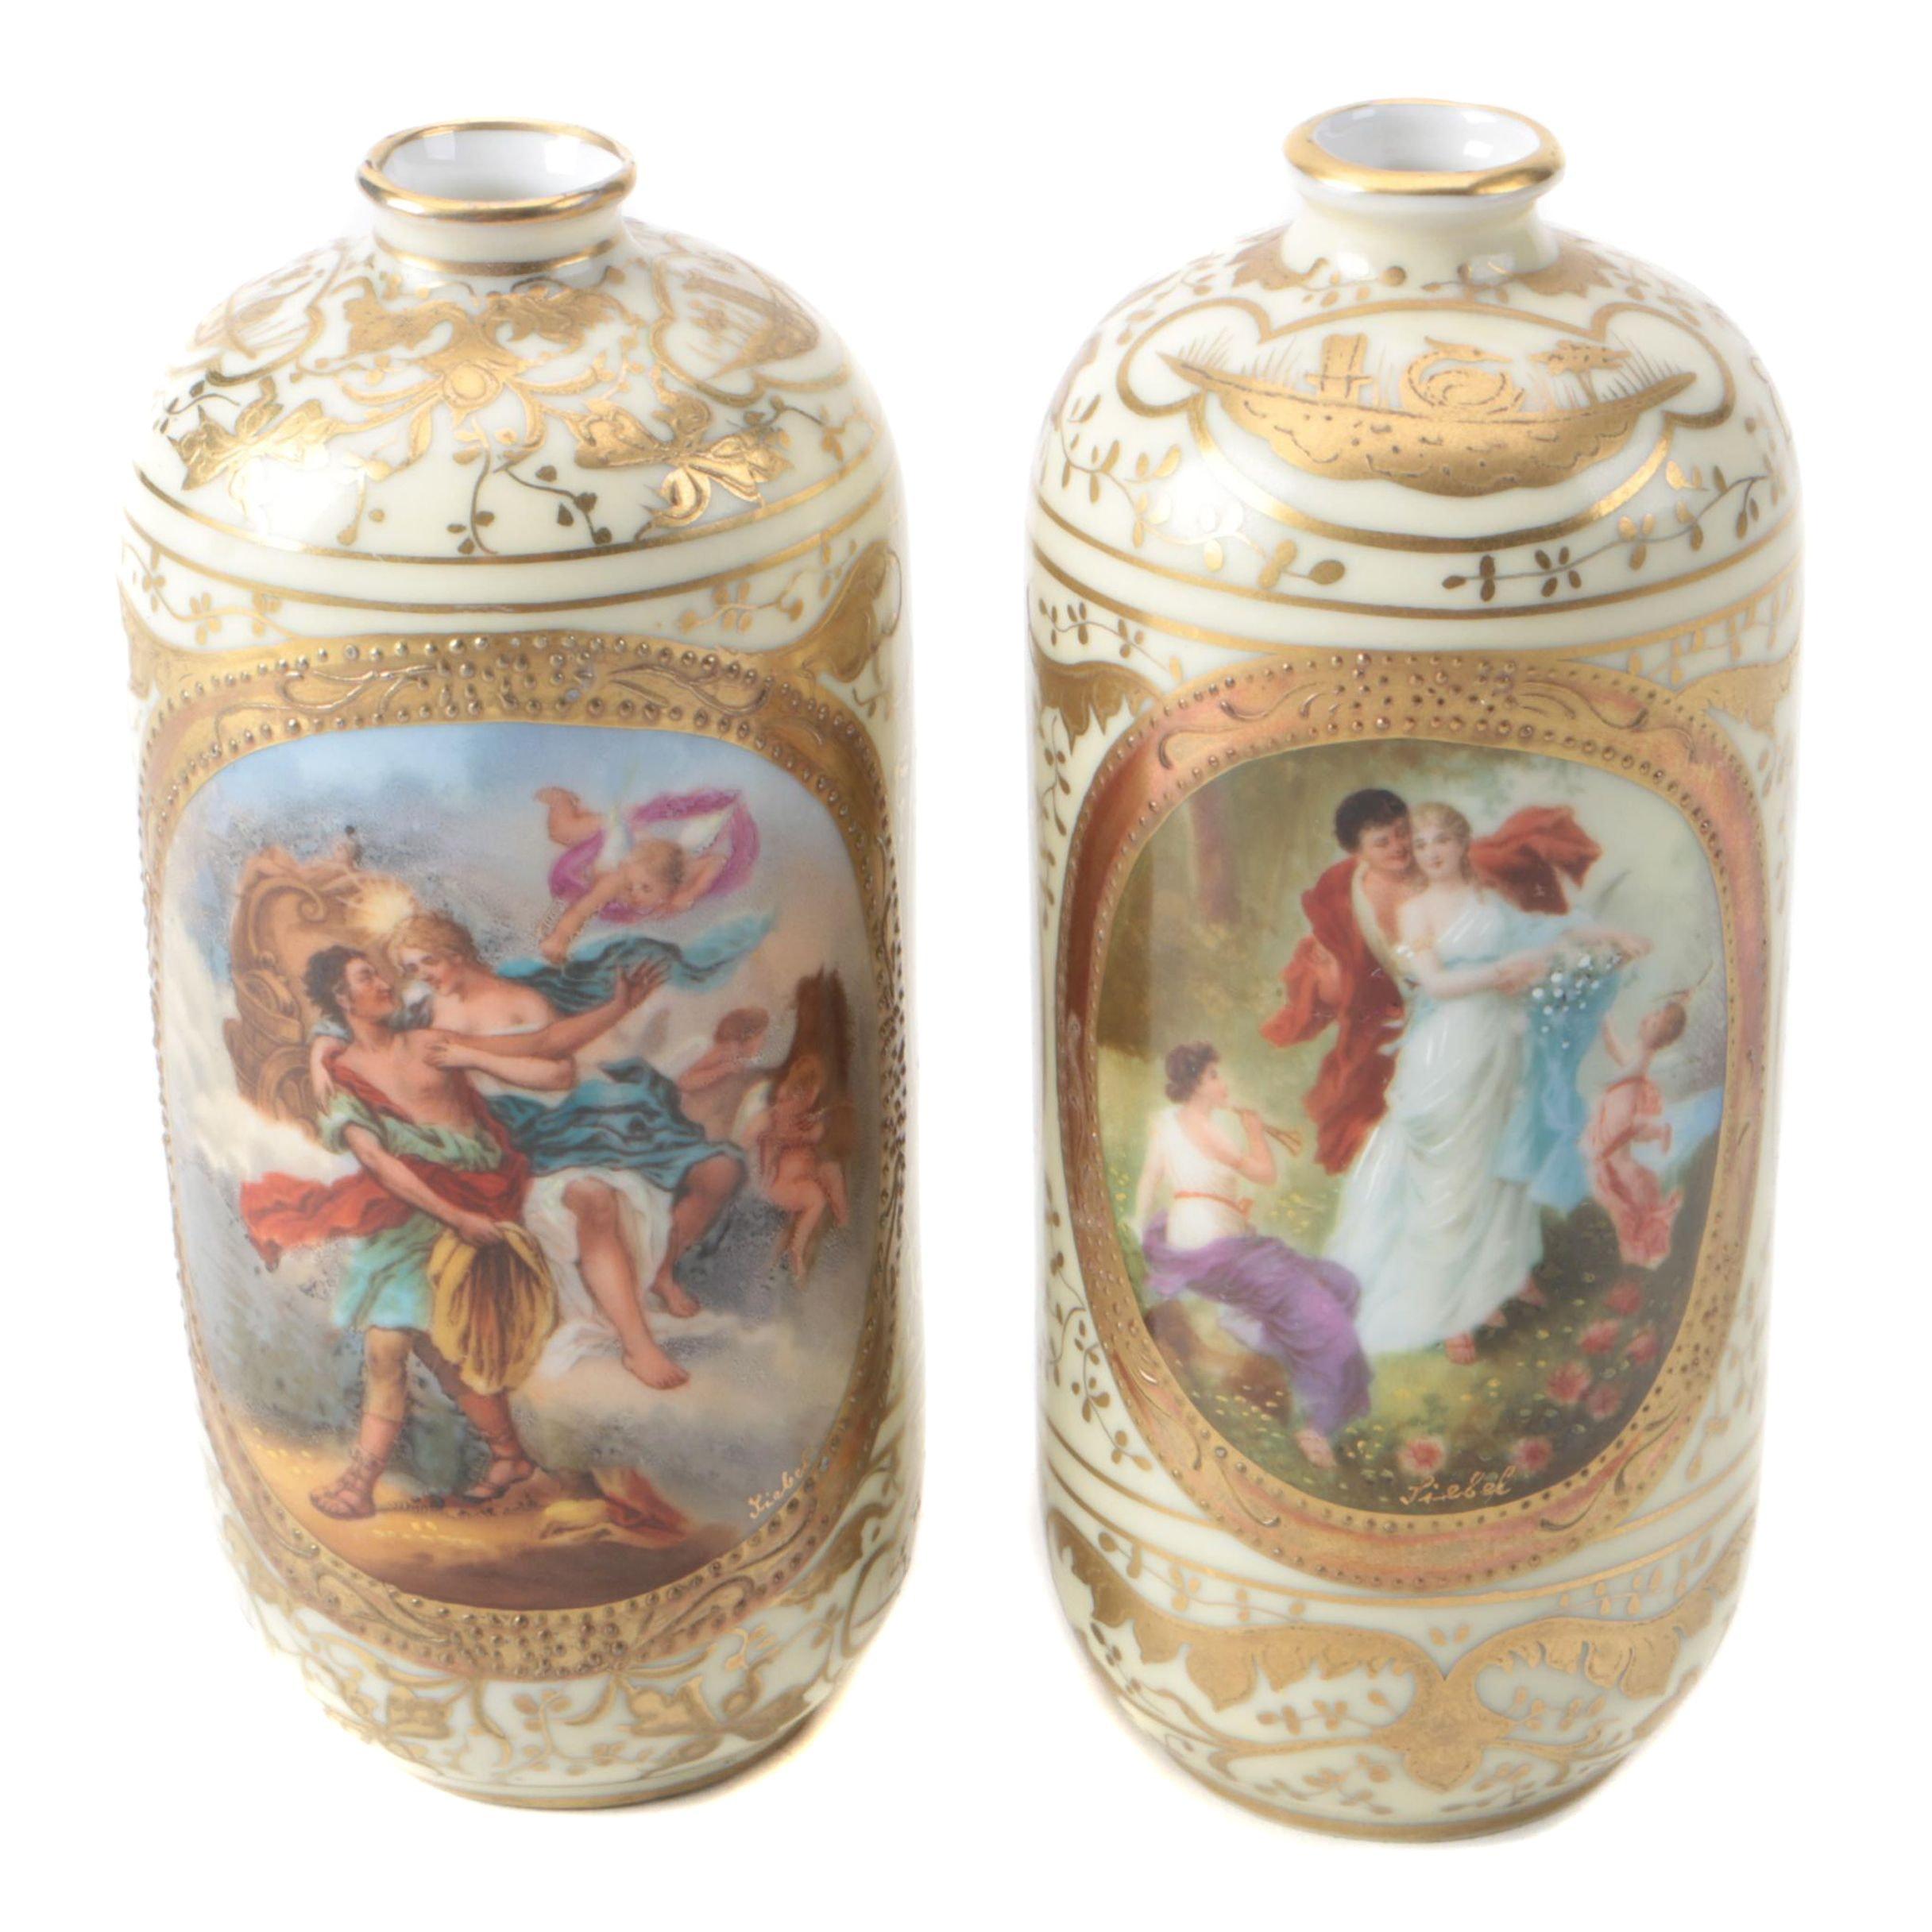 Vintage Austrian Hand-Painted Gilt Porcelain Bud Vases